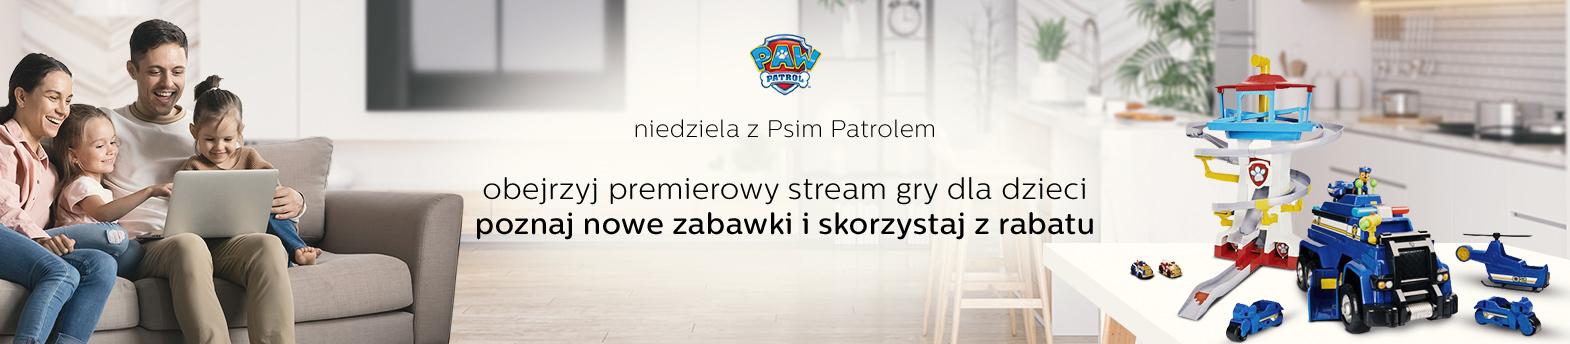 stream psi patrol